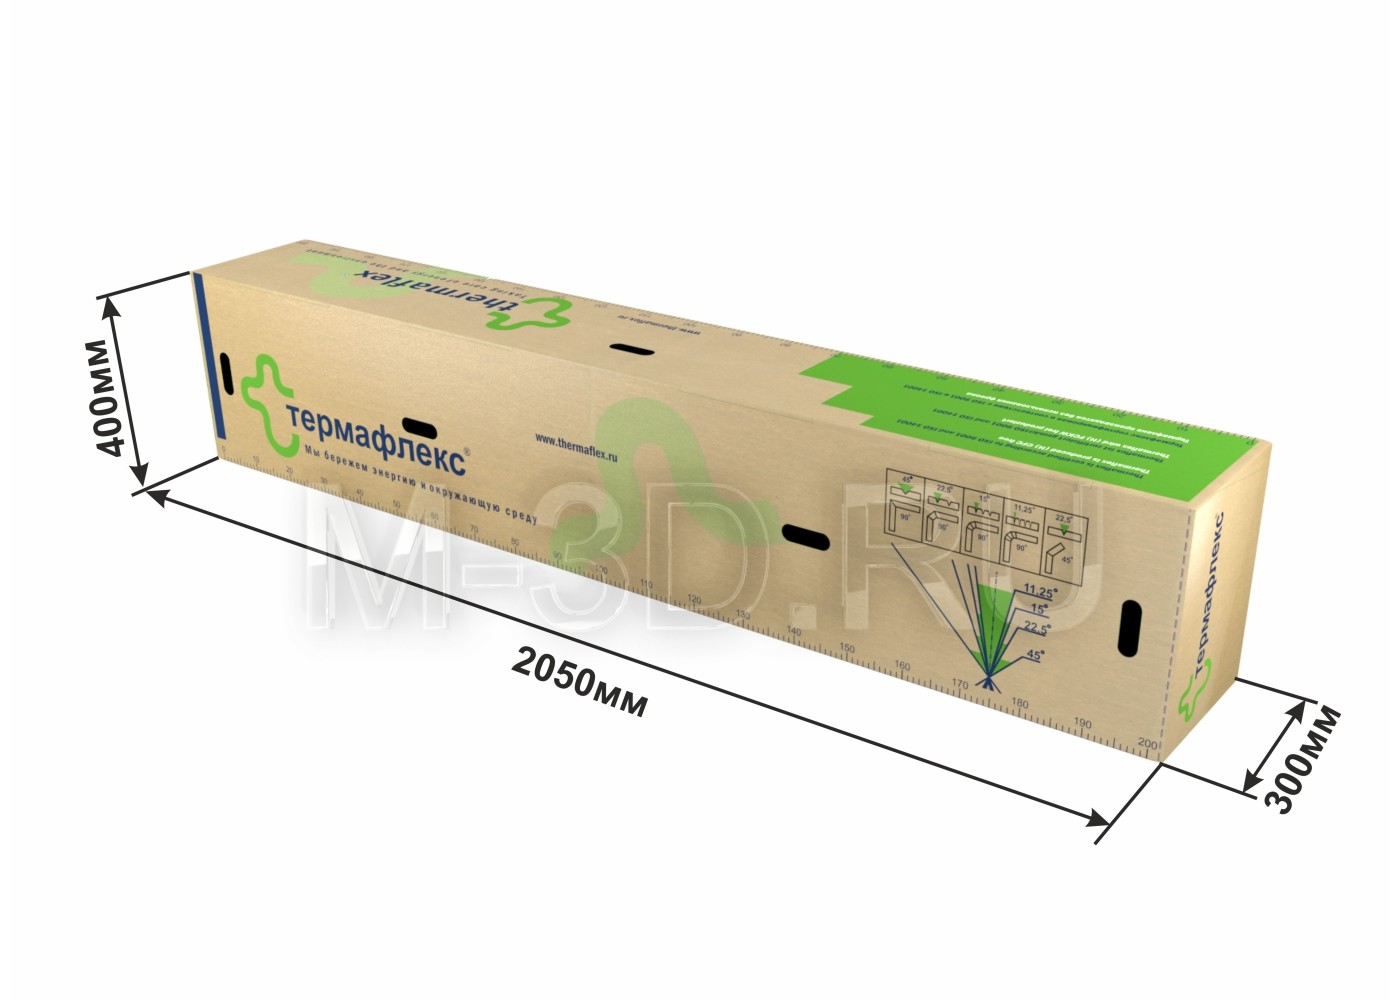 упаковка картонная для теплоизоляции